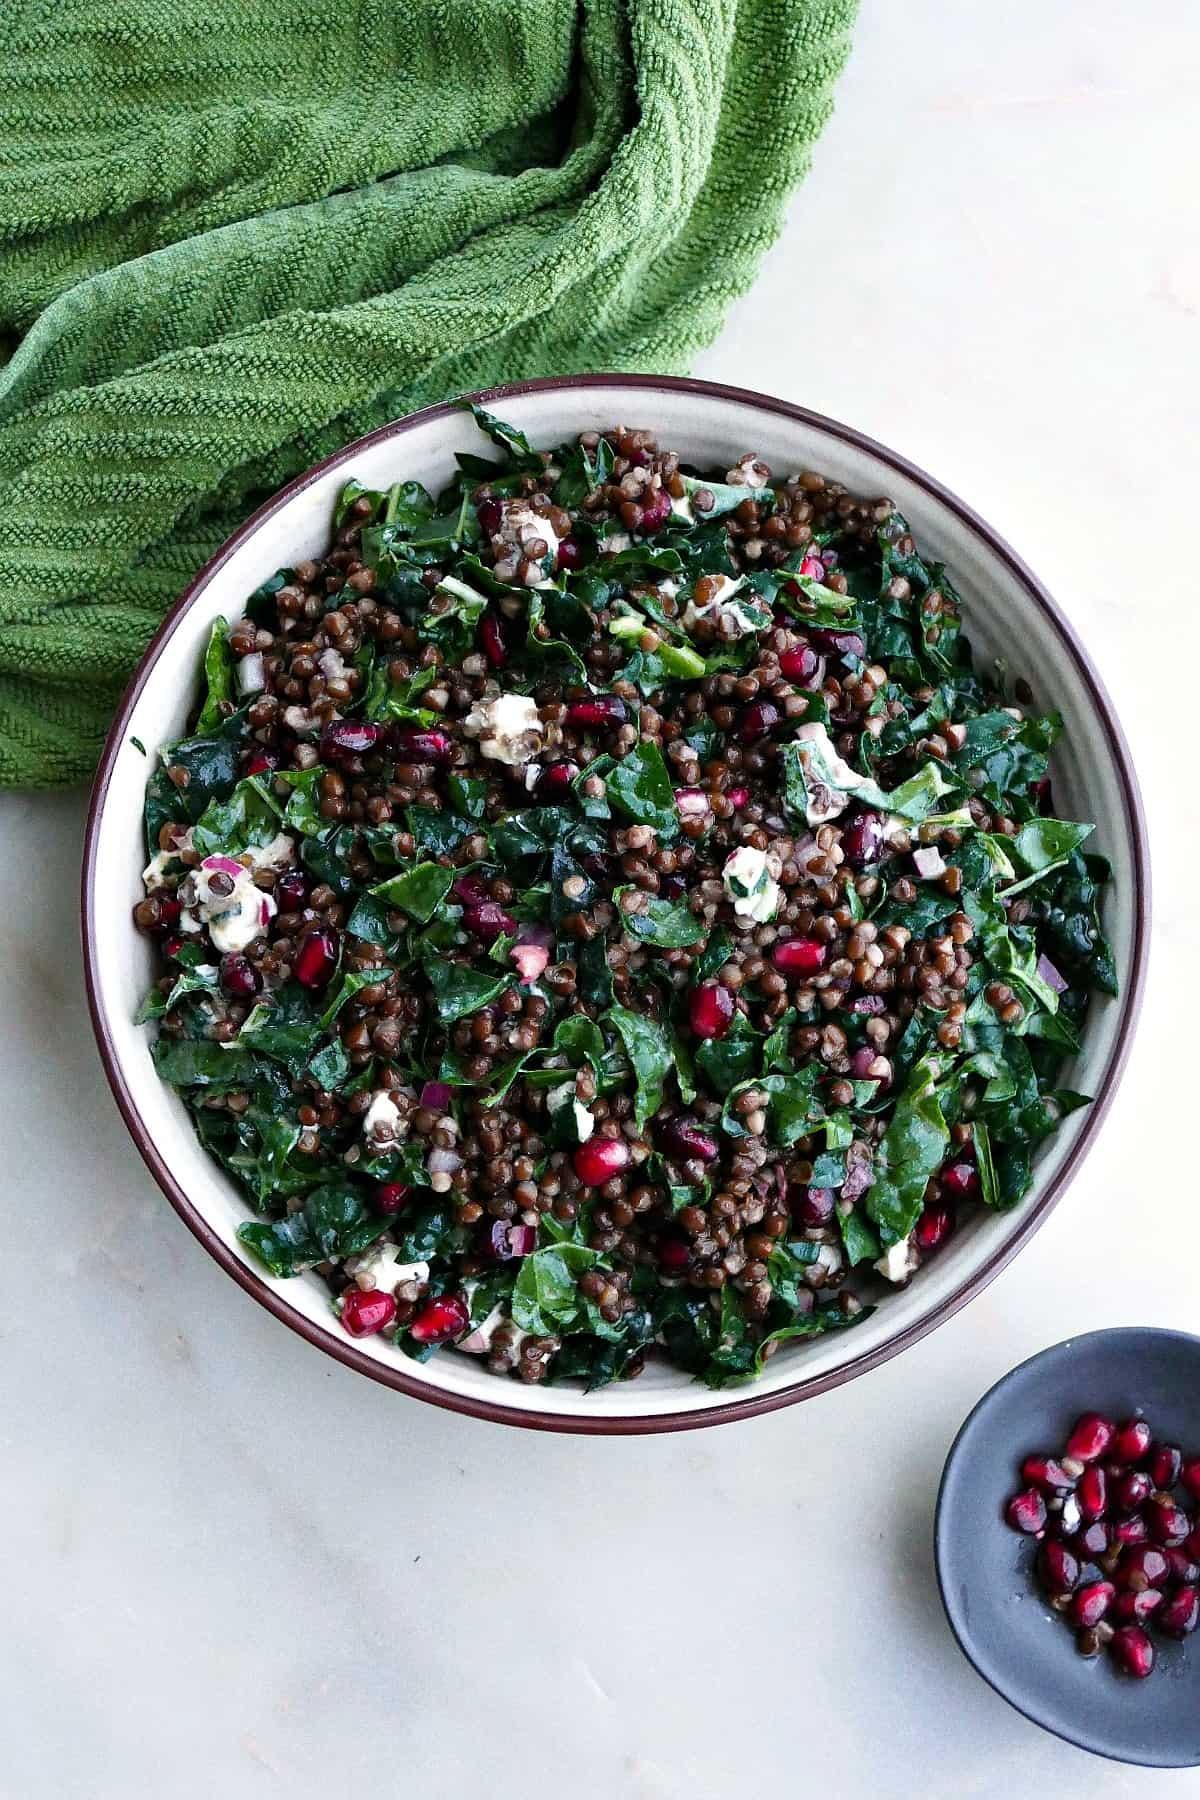 black lentil, kale, and pomegranate salad in a large serving bowl on a counter